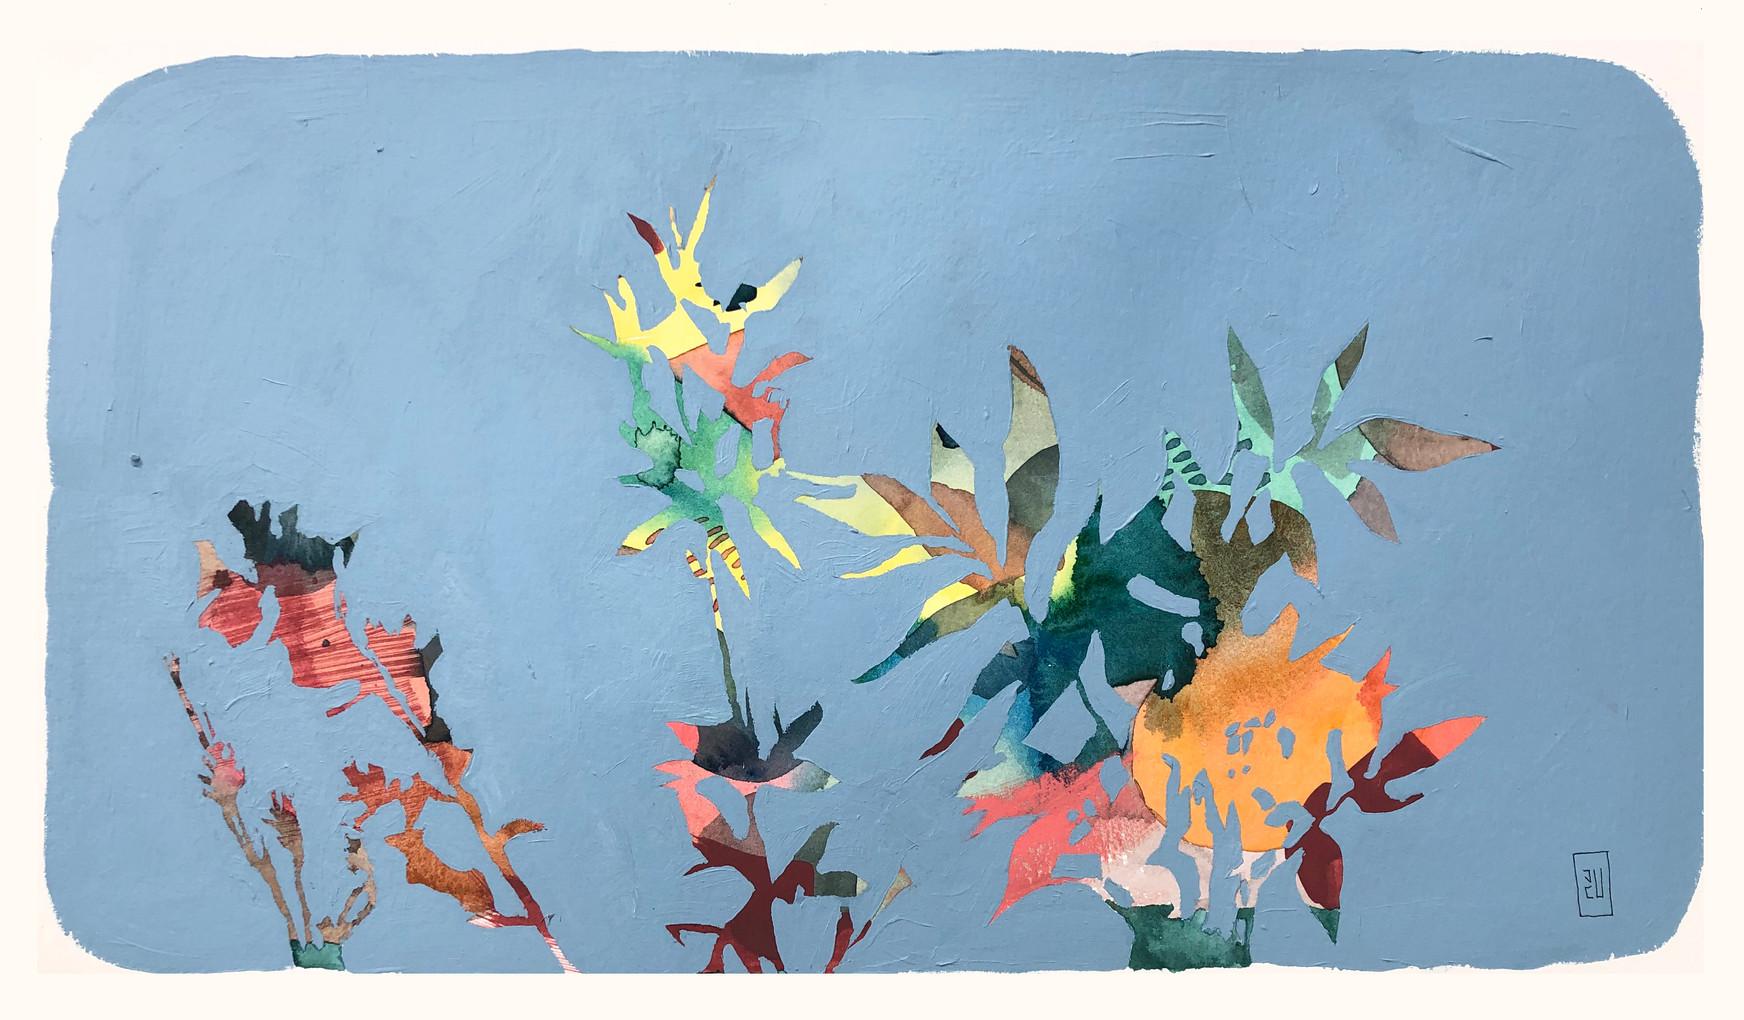 Botánico 1, Acuarela y acrílico sobre papel, 58 x 33 cm. 2019